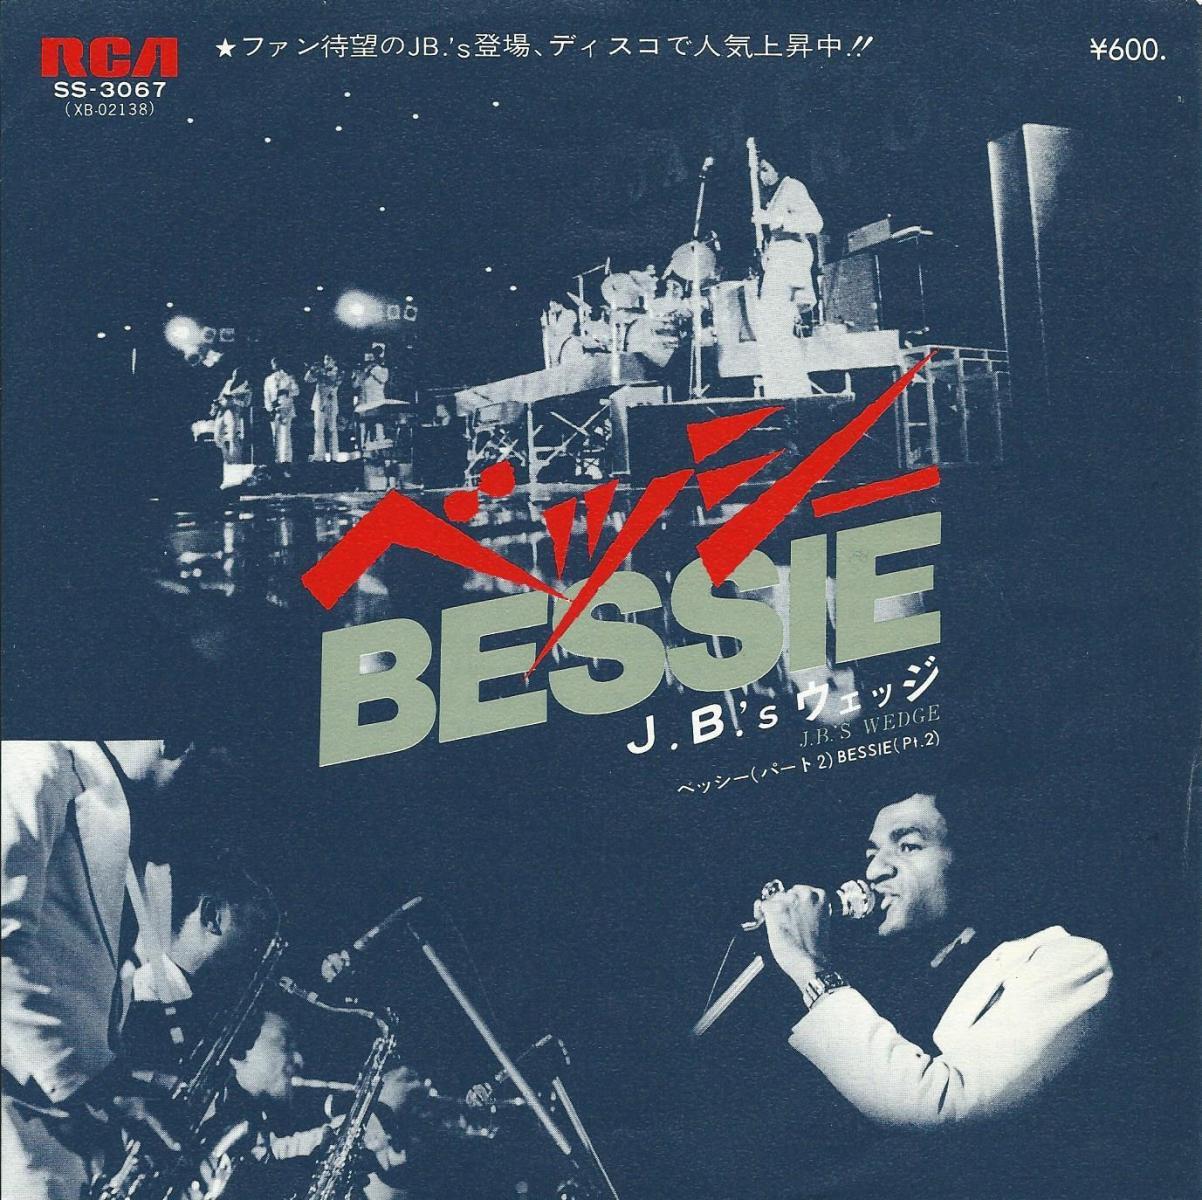 J.B.'Sウェッジ J.B.'S WEDGE / ベッシー BESSIE (7